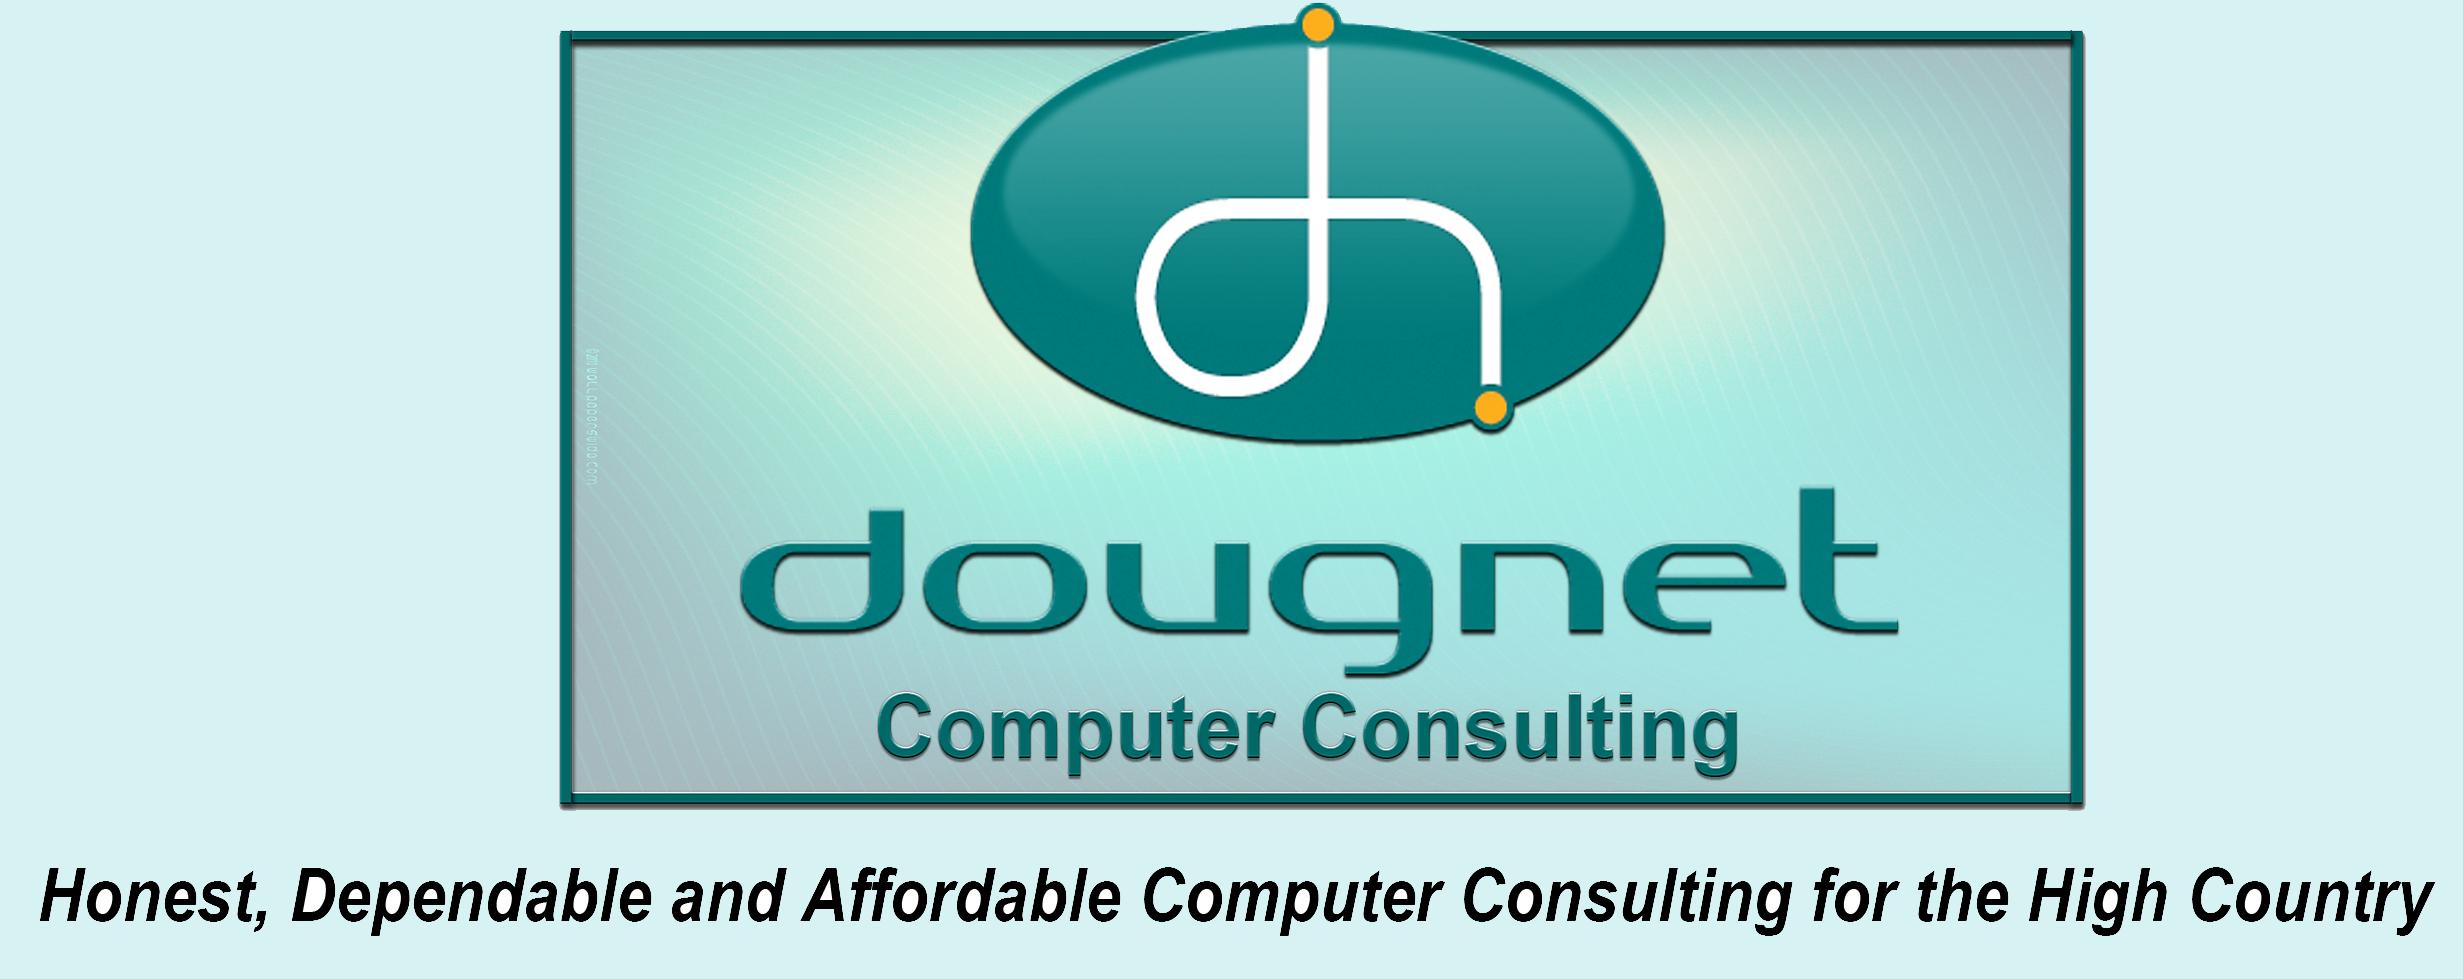 Dougnet Computer Consulting Logo